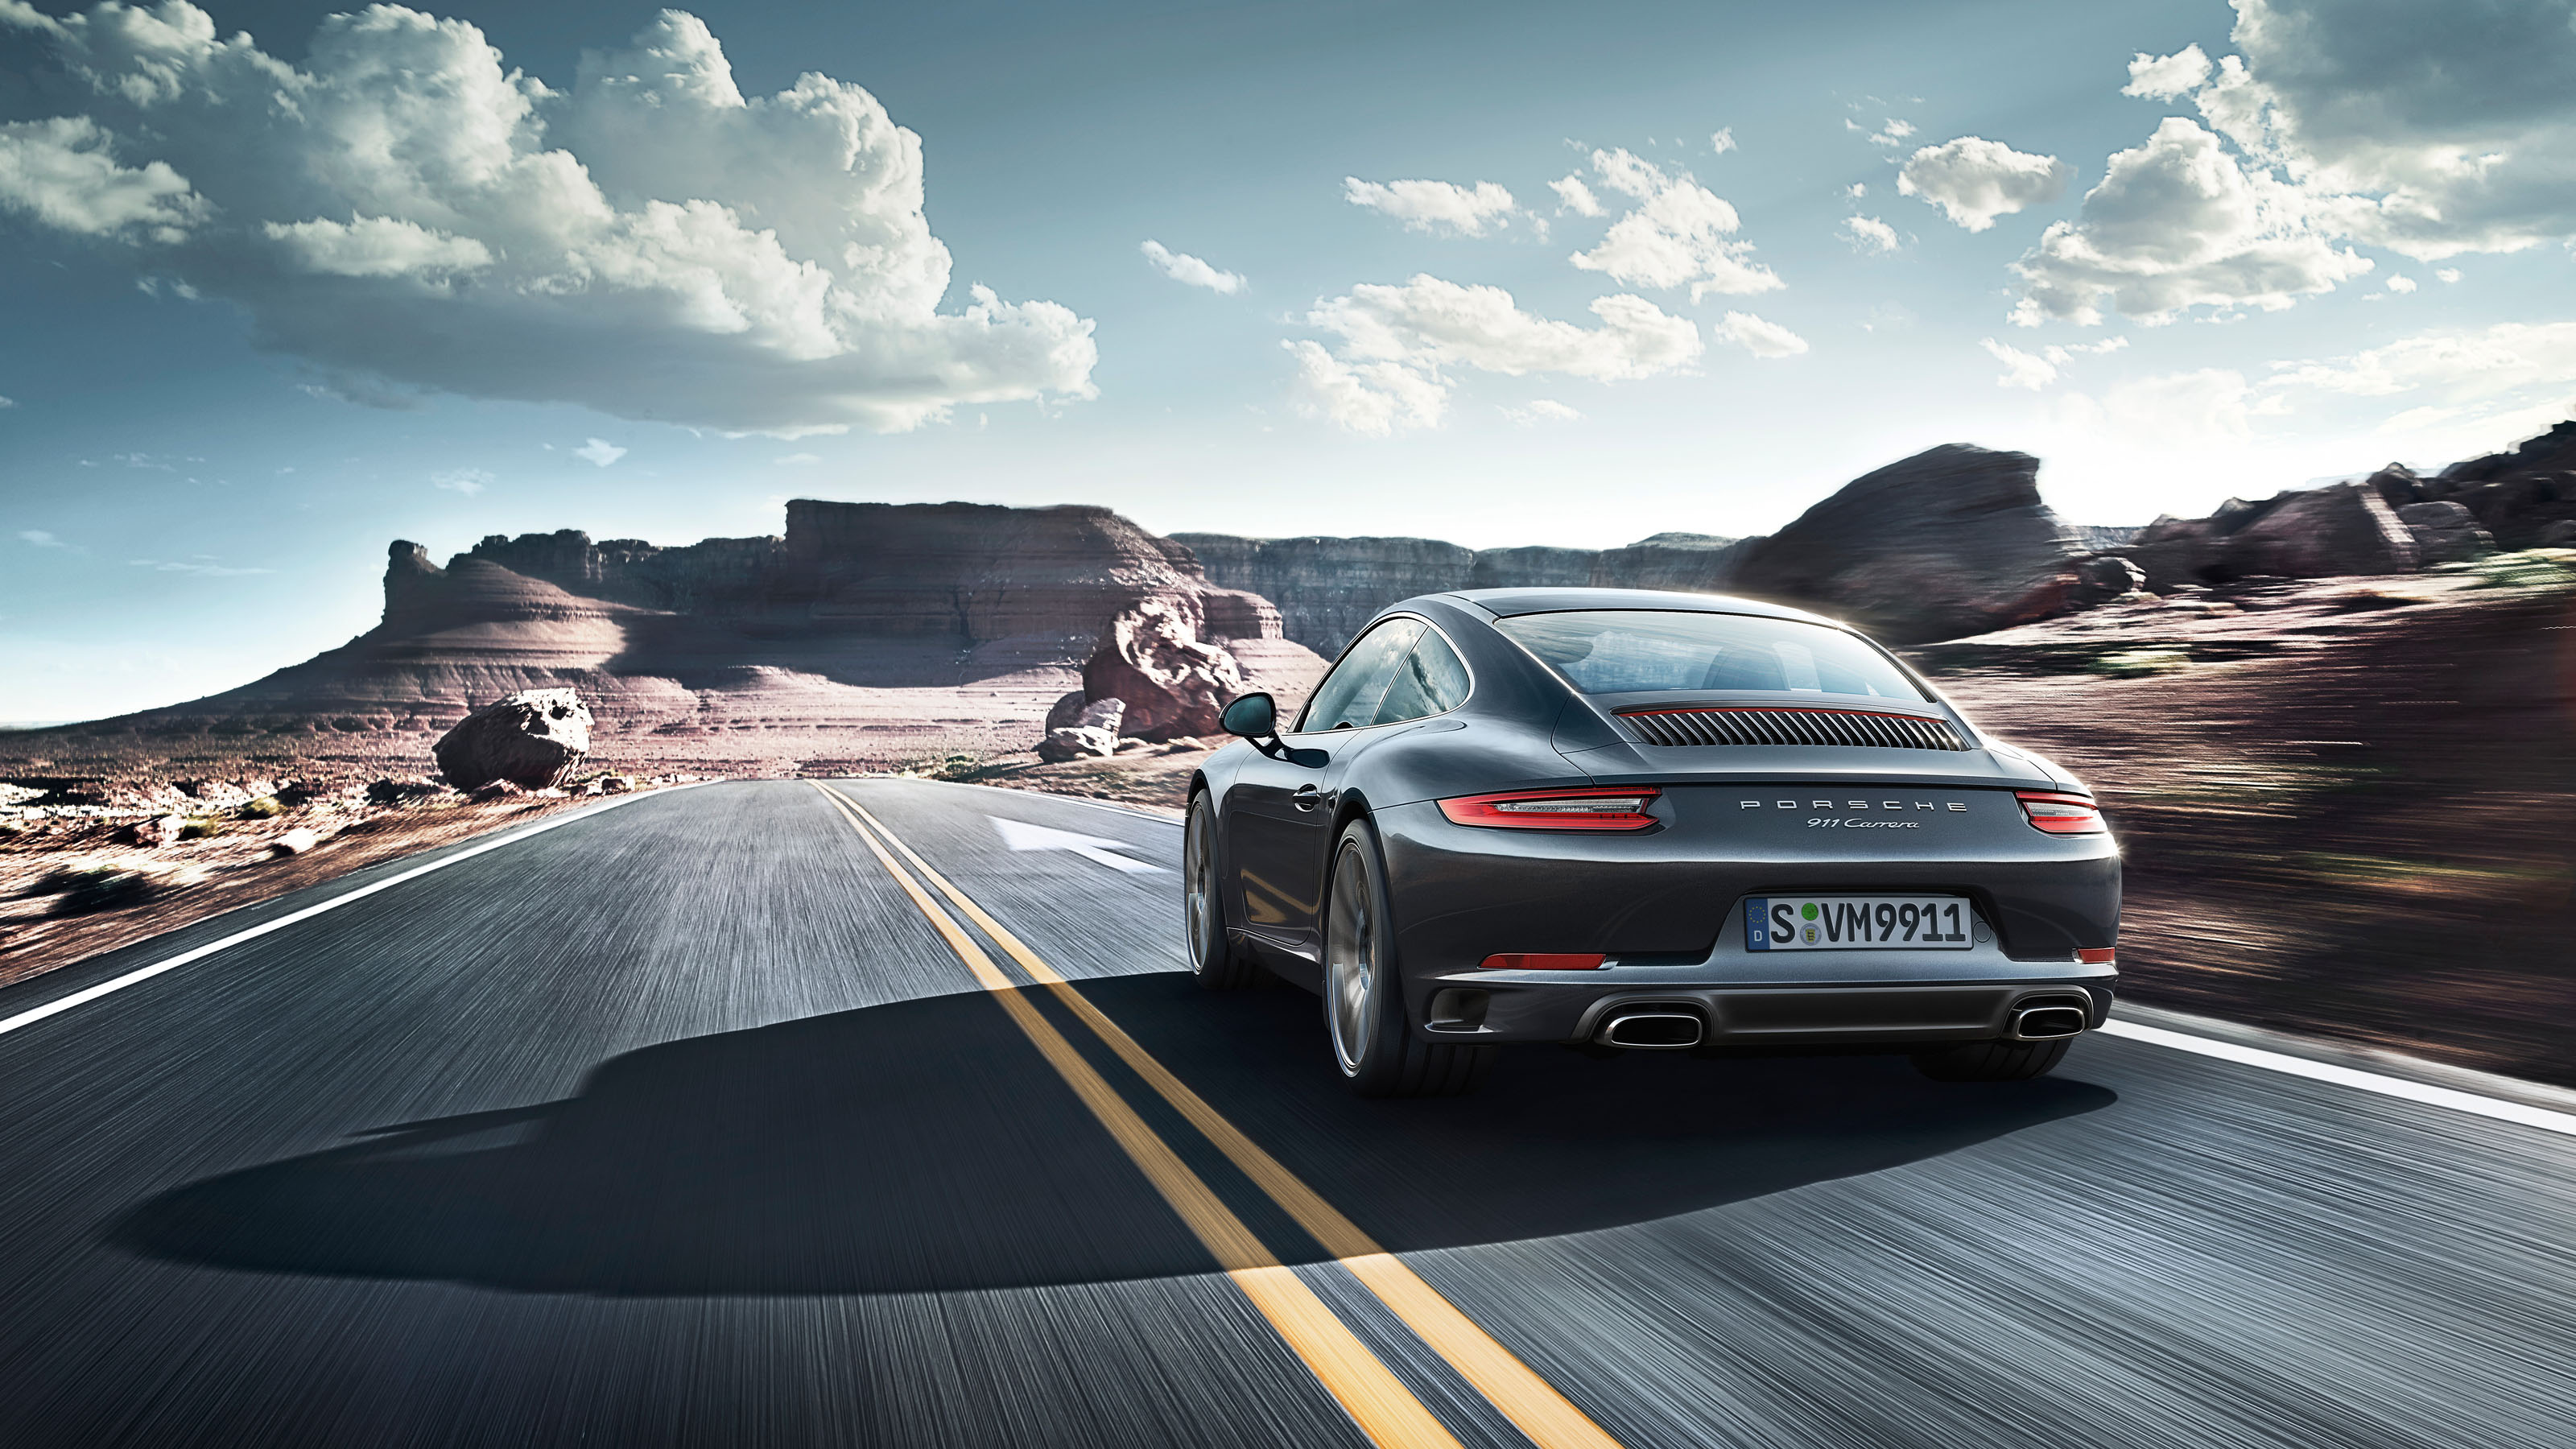 Porsche 911 Carrera 4k - HD Wallpaper